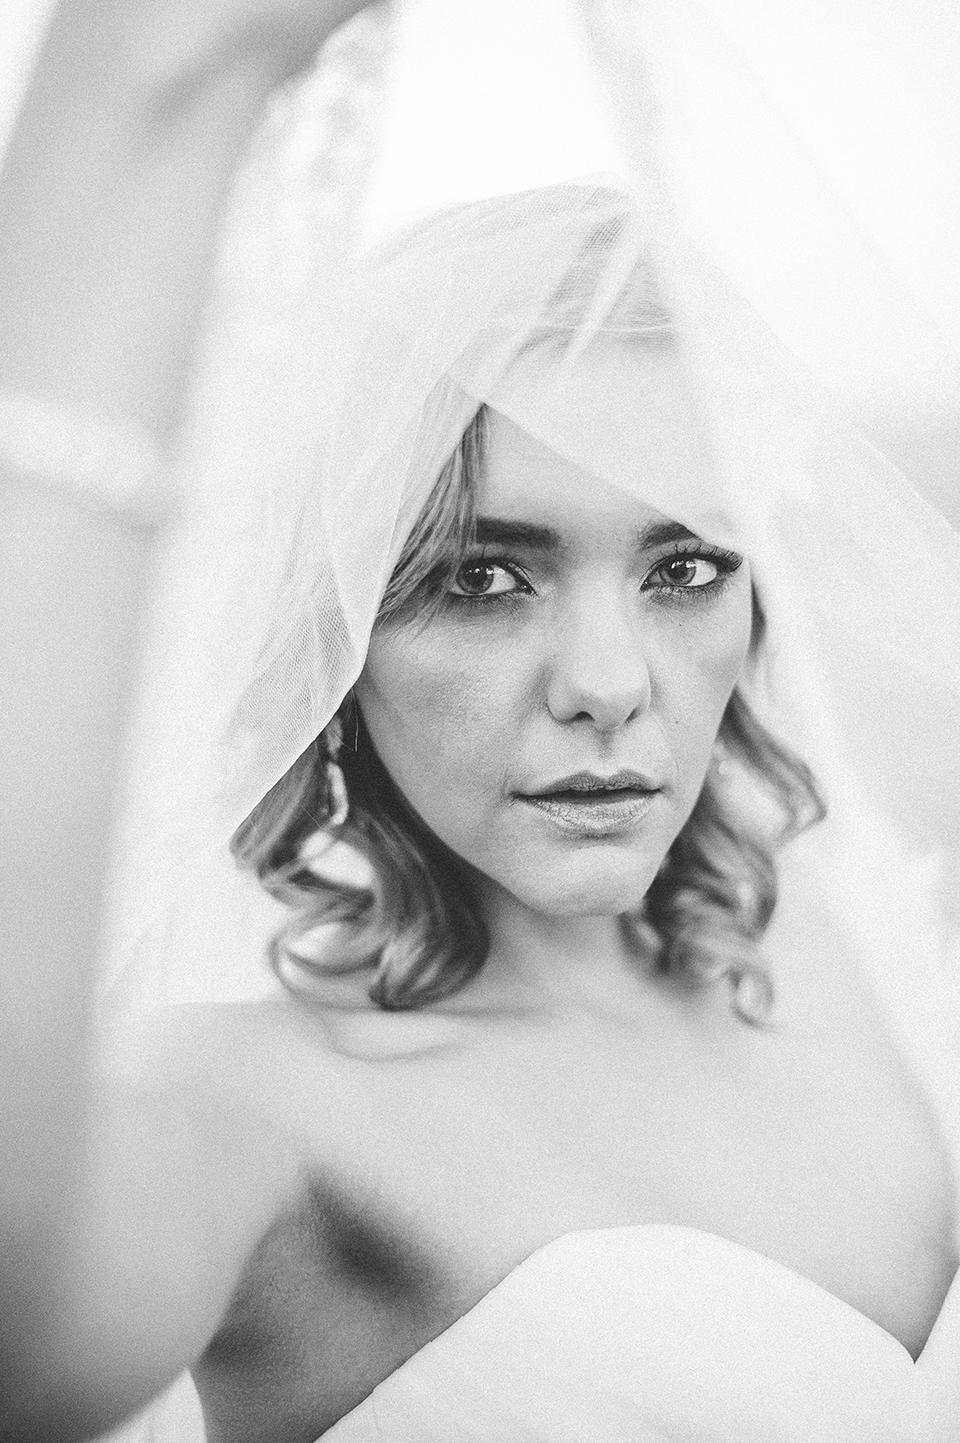 RYAN PARKER_FINE ART WEDDING PHOTOGRAPHER_WORKSHOP 2015_DSC_0568.jpg